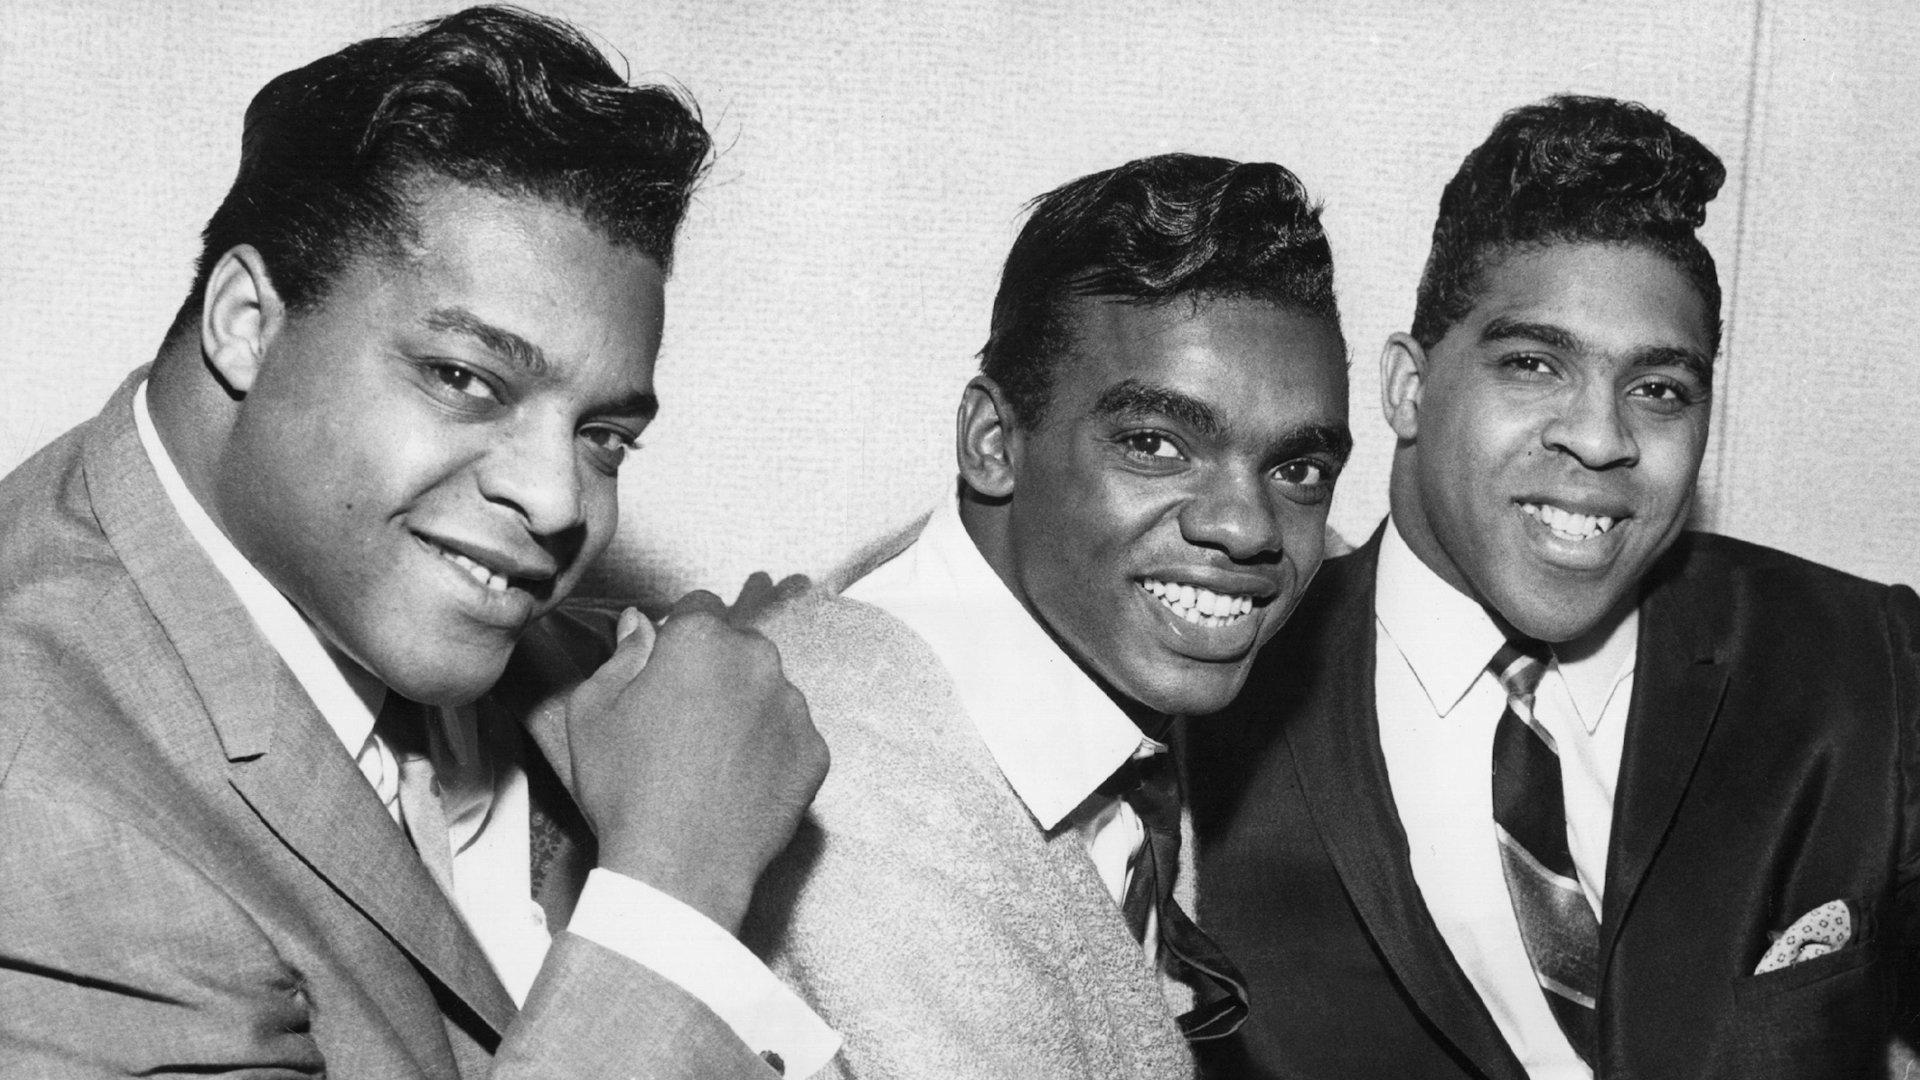 The Isley Brothers Twistin With Linda